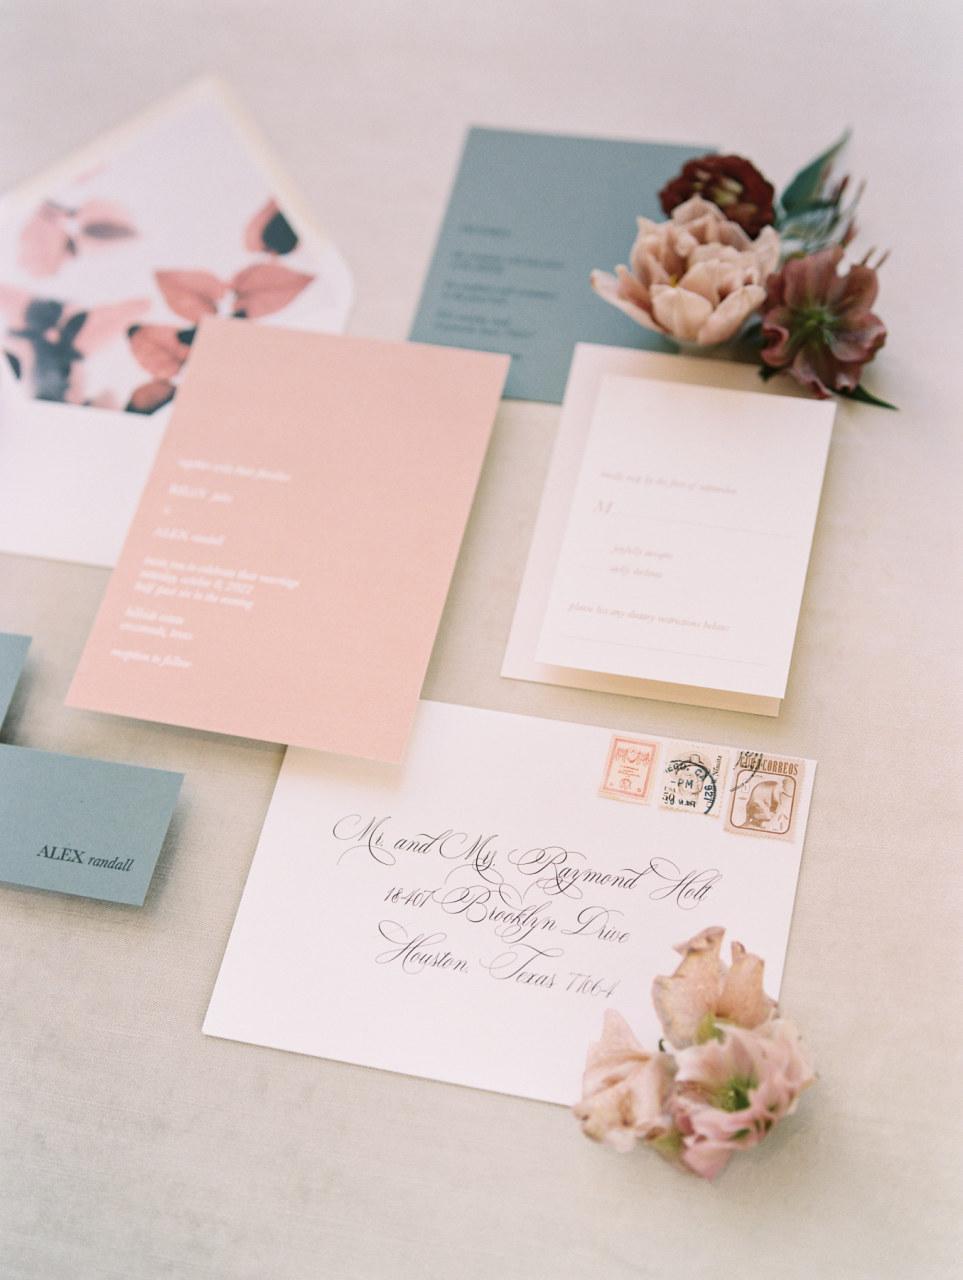 Blush and blue wedding stationery design